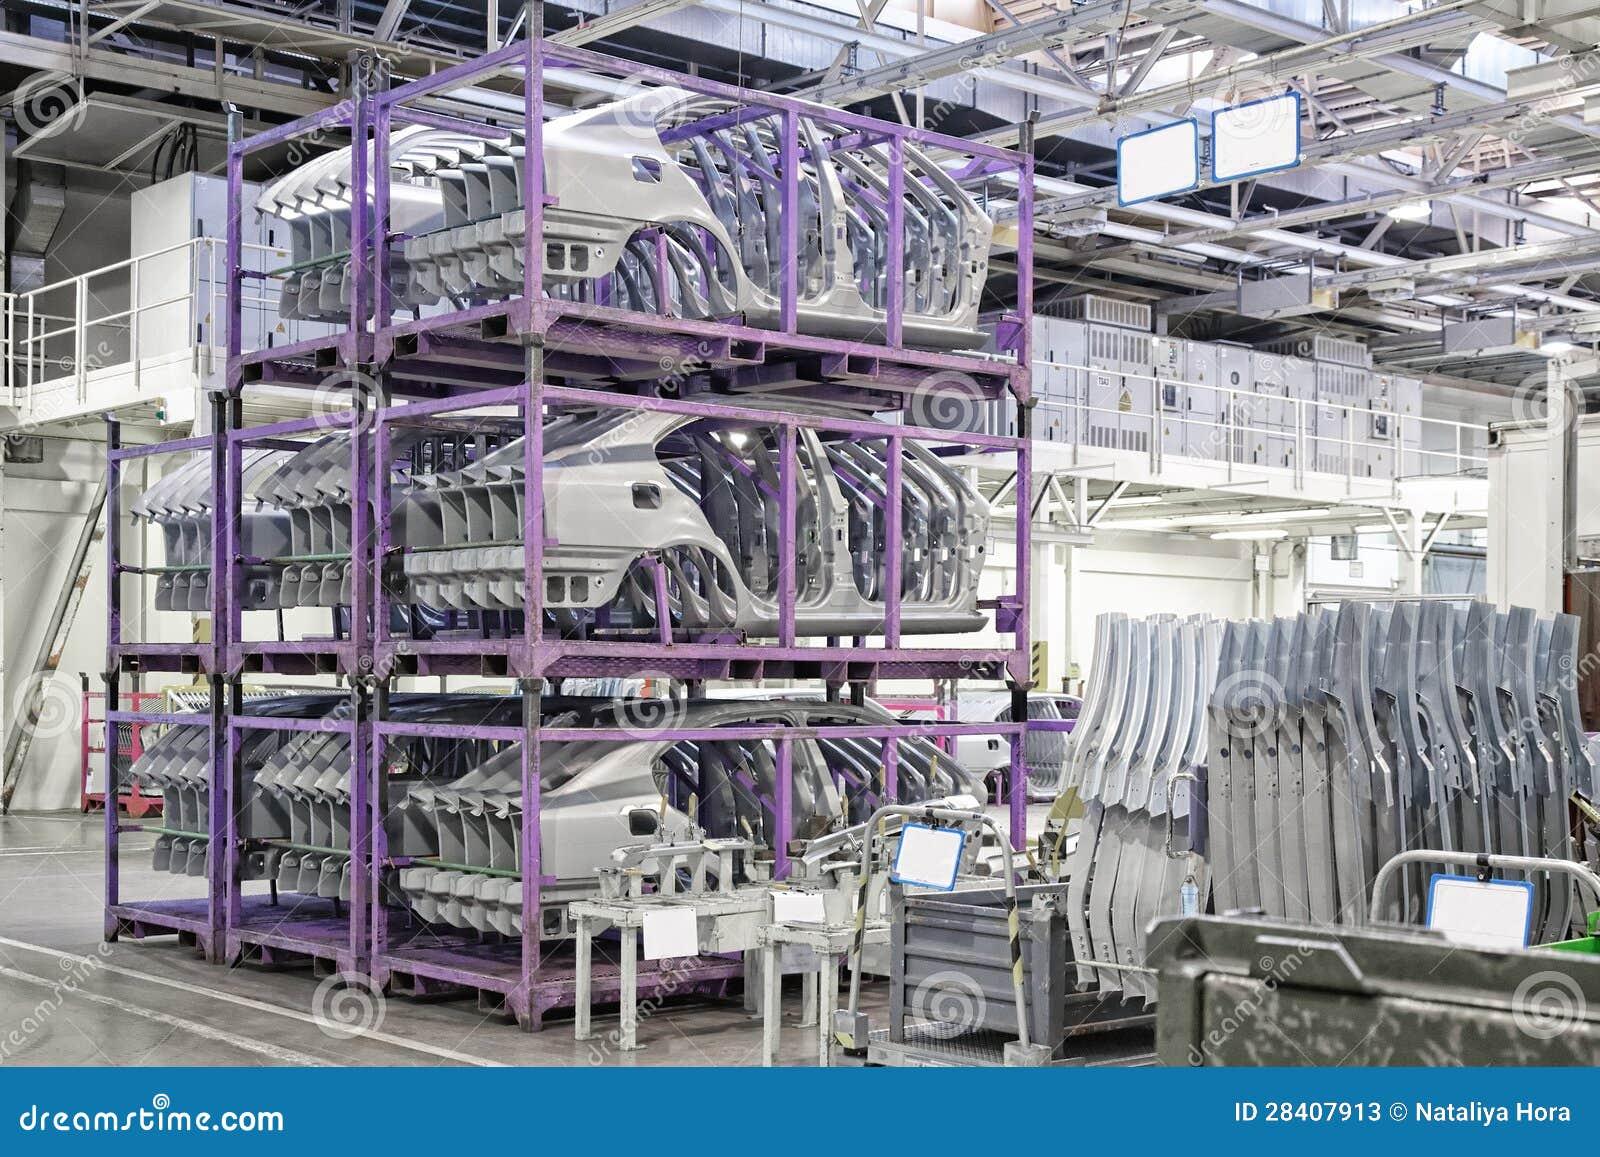 Big Brands Of World further Gms Story Old One Even Gm additionally Deze 9 Verlaten Autofabrieken Zijn Hypnotiserend 63346 additionally Biofuels besides Manufacturing Plants In Mexico kUU5jc8wgAm48tu24O0kry YqpSCX2wnO M8TTUHTA. on us auto manufacturing plants map